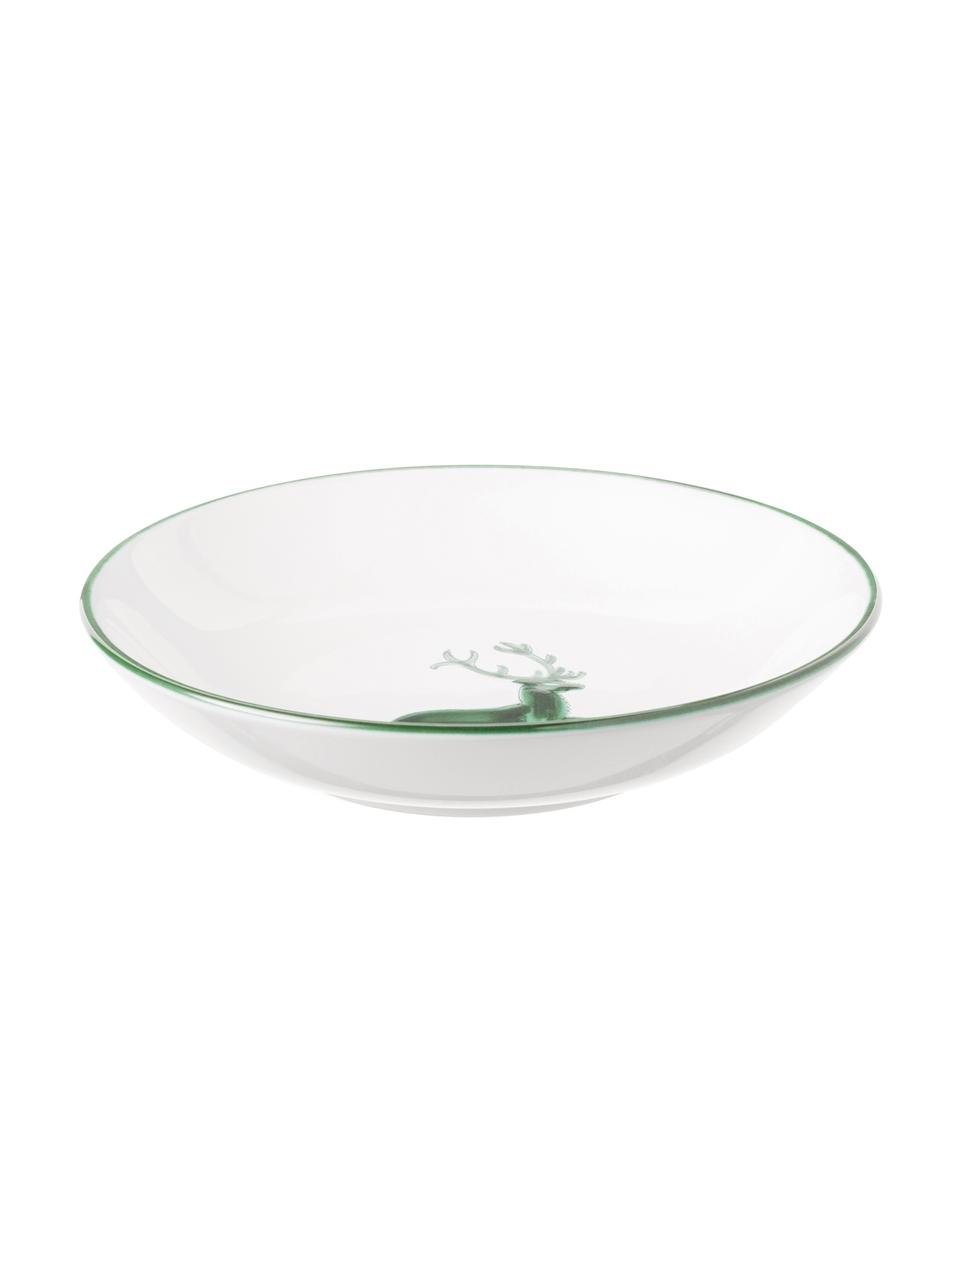 Handbeschilderd soepbord Classic Green Deer, Keramiek, Wit, Ø 20 cm